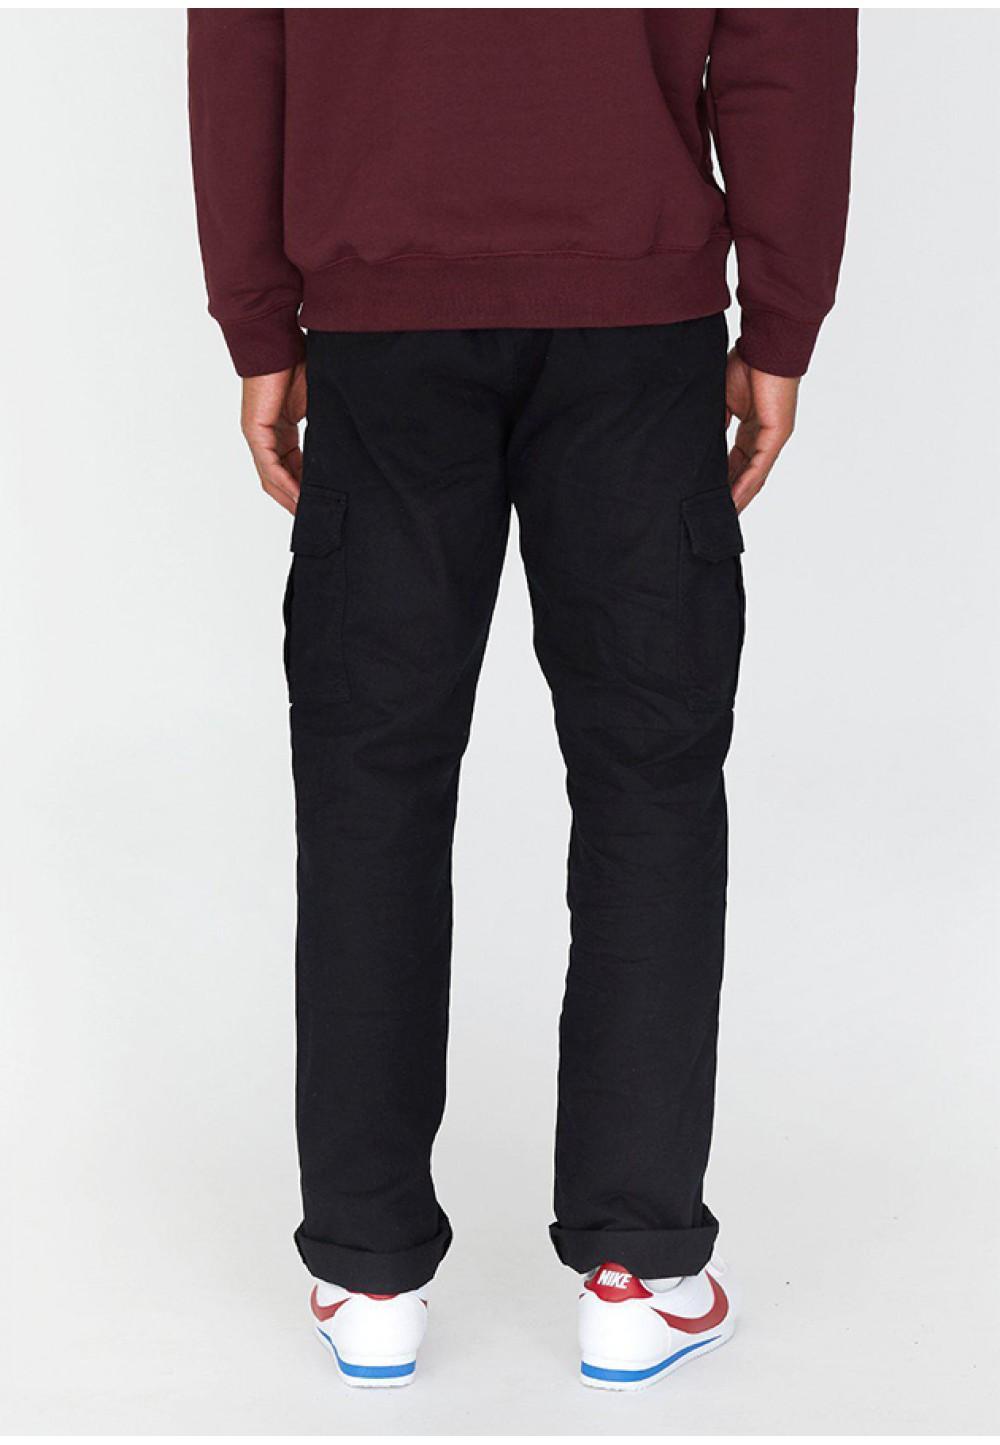 Чорні брюки з накладними кишенями Dash Cargo